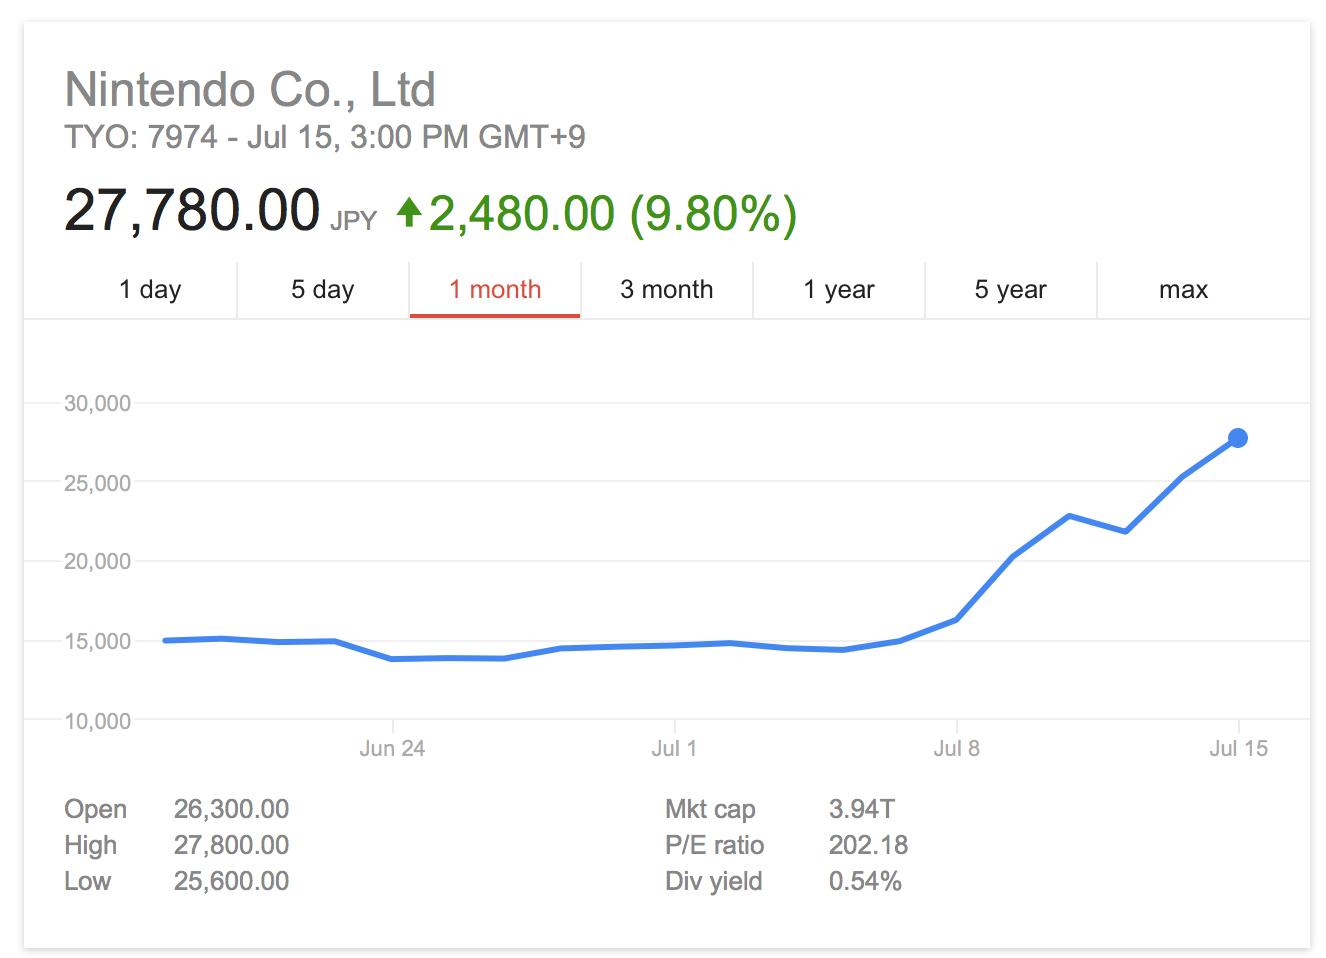 Courtesy of Yahoo! Finance